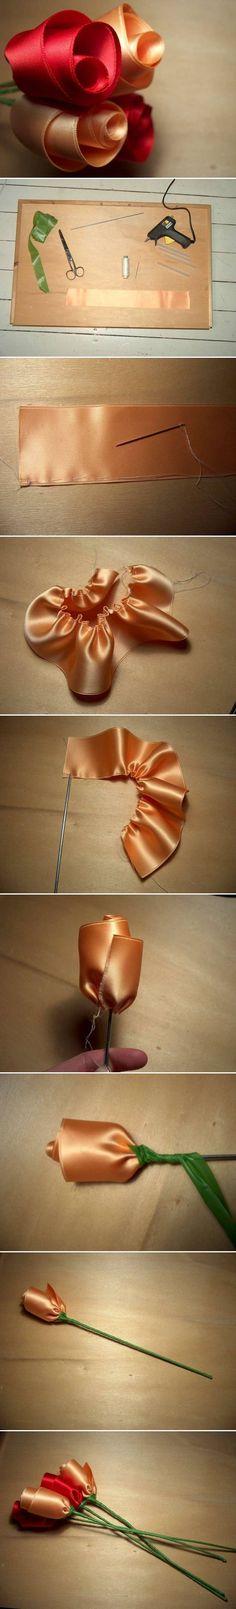 DIY Easy Satin Ribbon Roses | iCreativeIdeas.com LIKE Us on Facebook ==> https://www.facebook.com/icreativeideas Diy Ideas, Satin Ribbon, Ribbon10 Diy, Ribbons, Roses, Ribbon Rose, Table Centerpieces, Diy Quick, Ribbon Flower